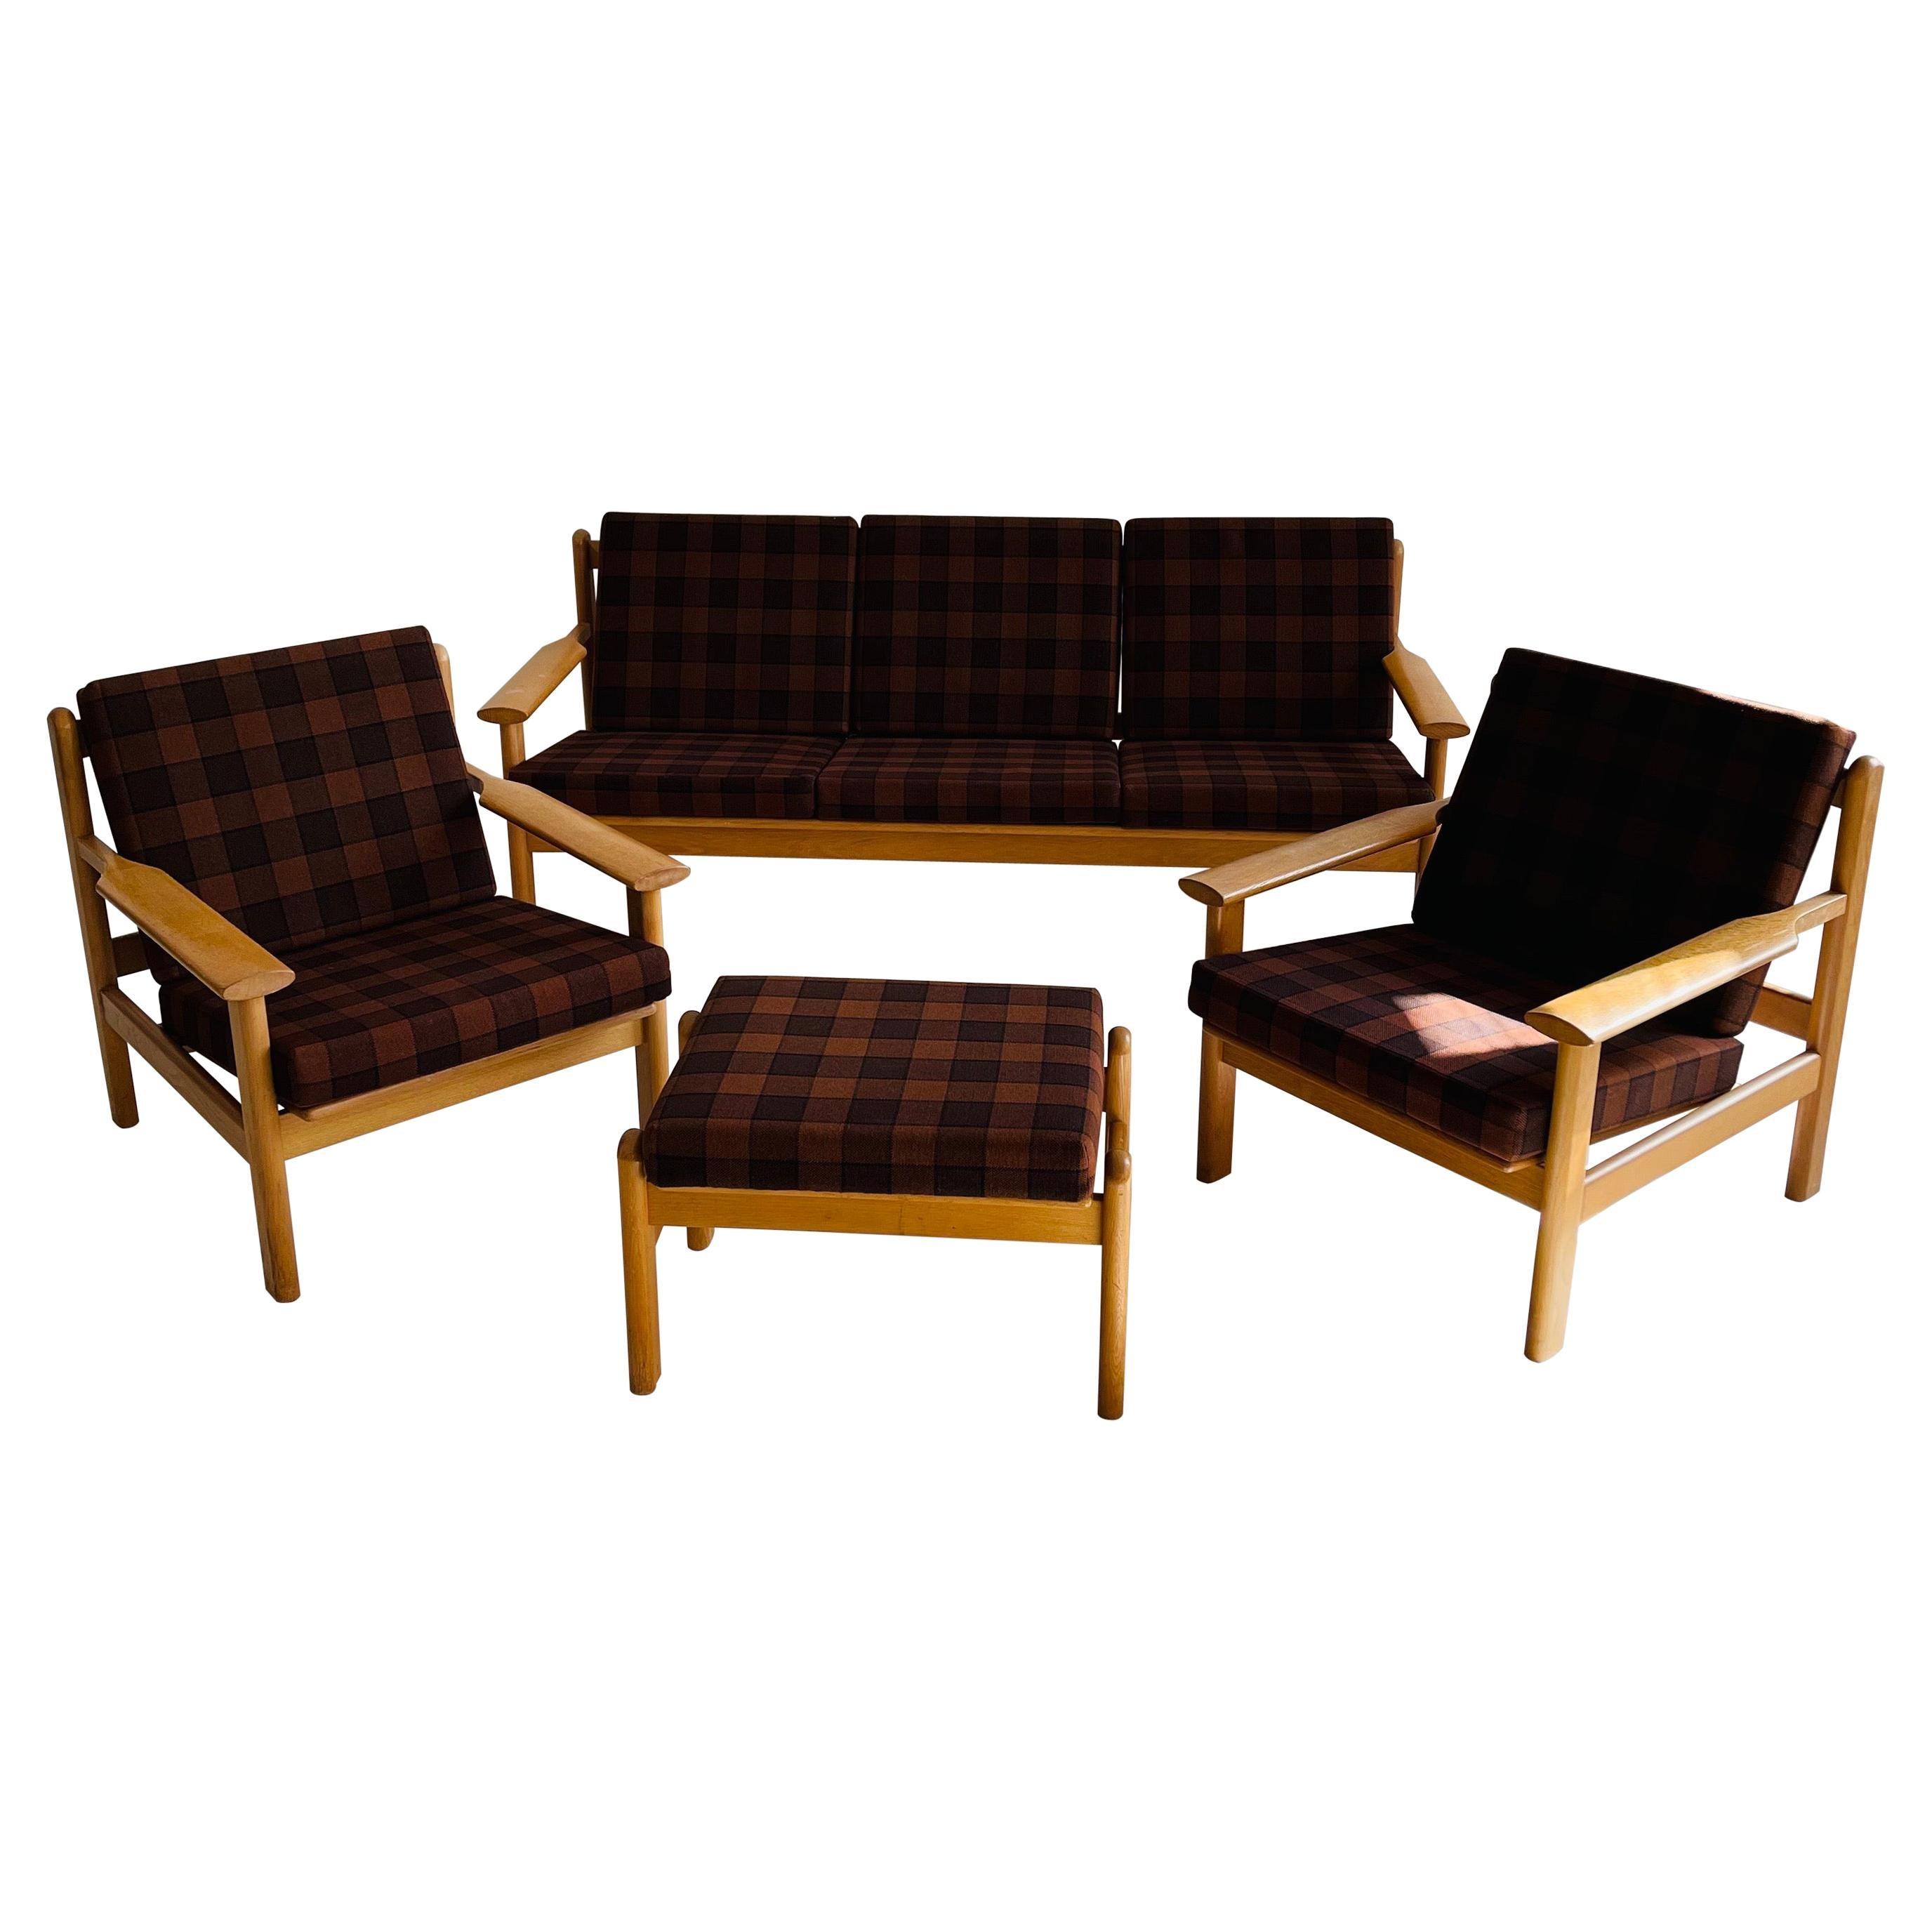 Living Room Suite Sofa Lounge Chair by Poul Volther for Frem Rølje, Denmark 1950